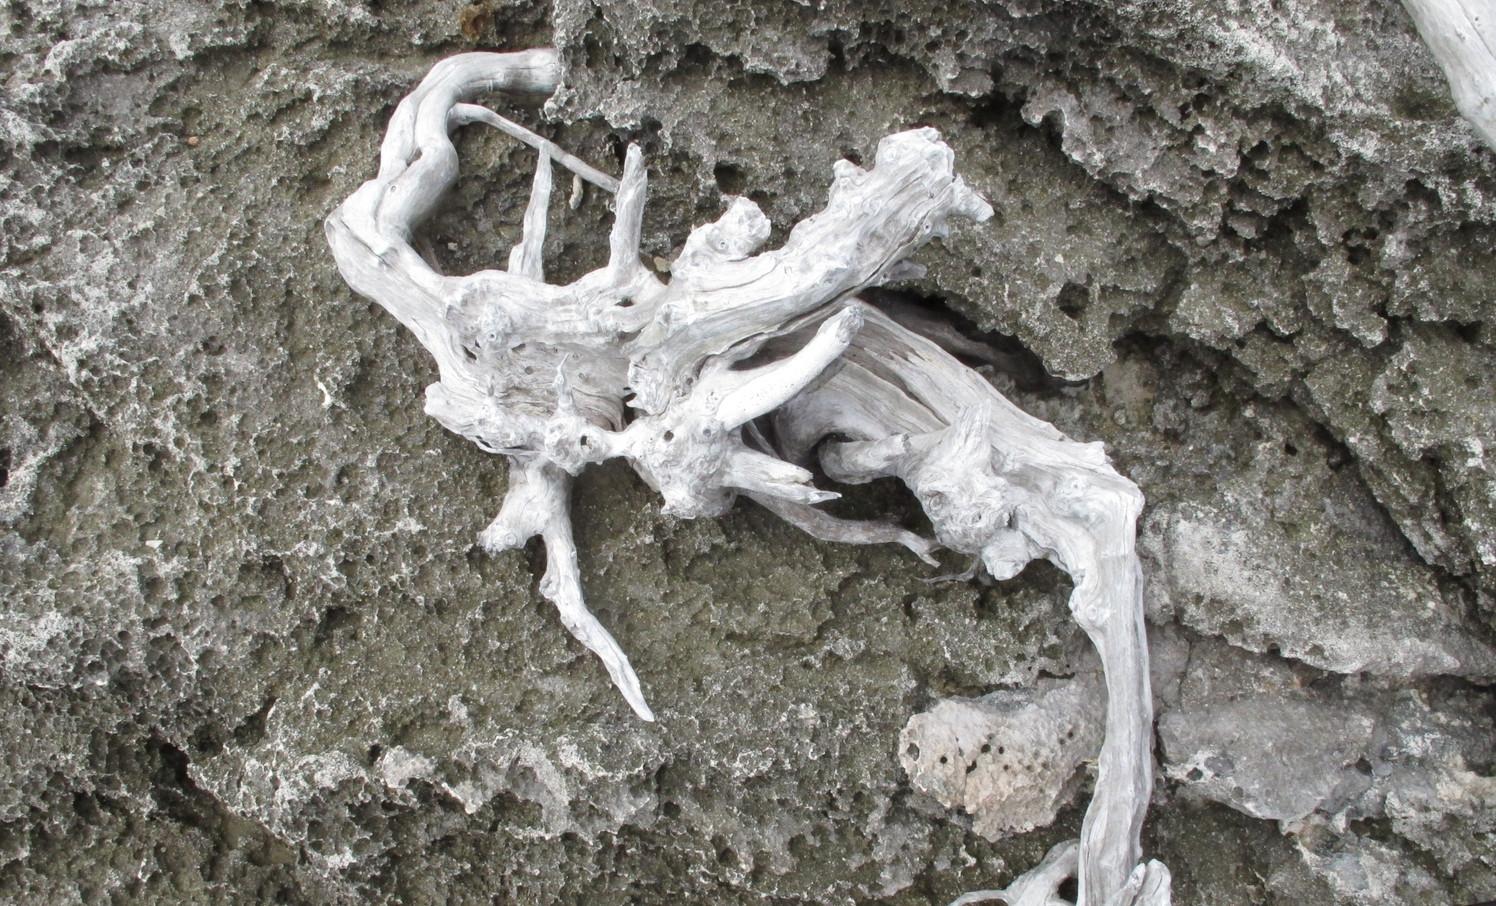 Cinders and Bones